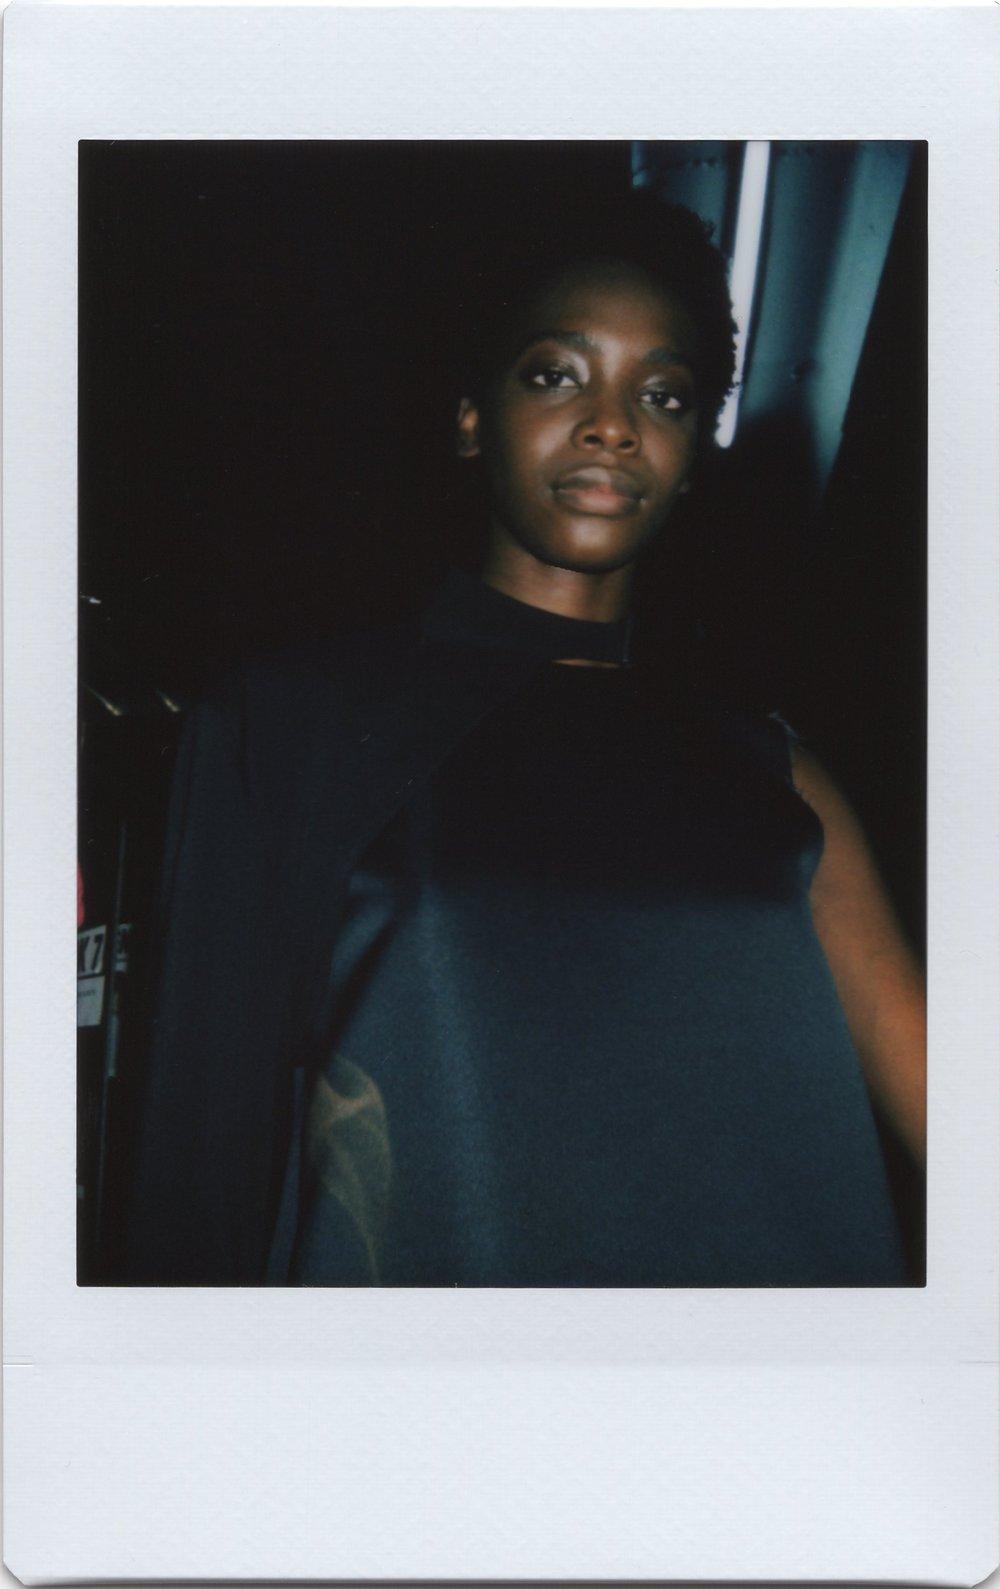 YangLi_Honigschreck_Backstage_Polaroid_3.jpg